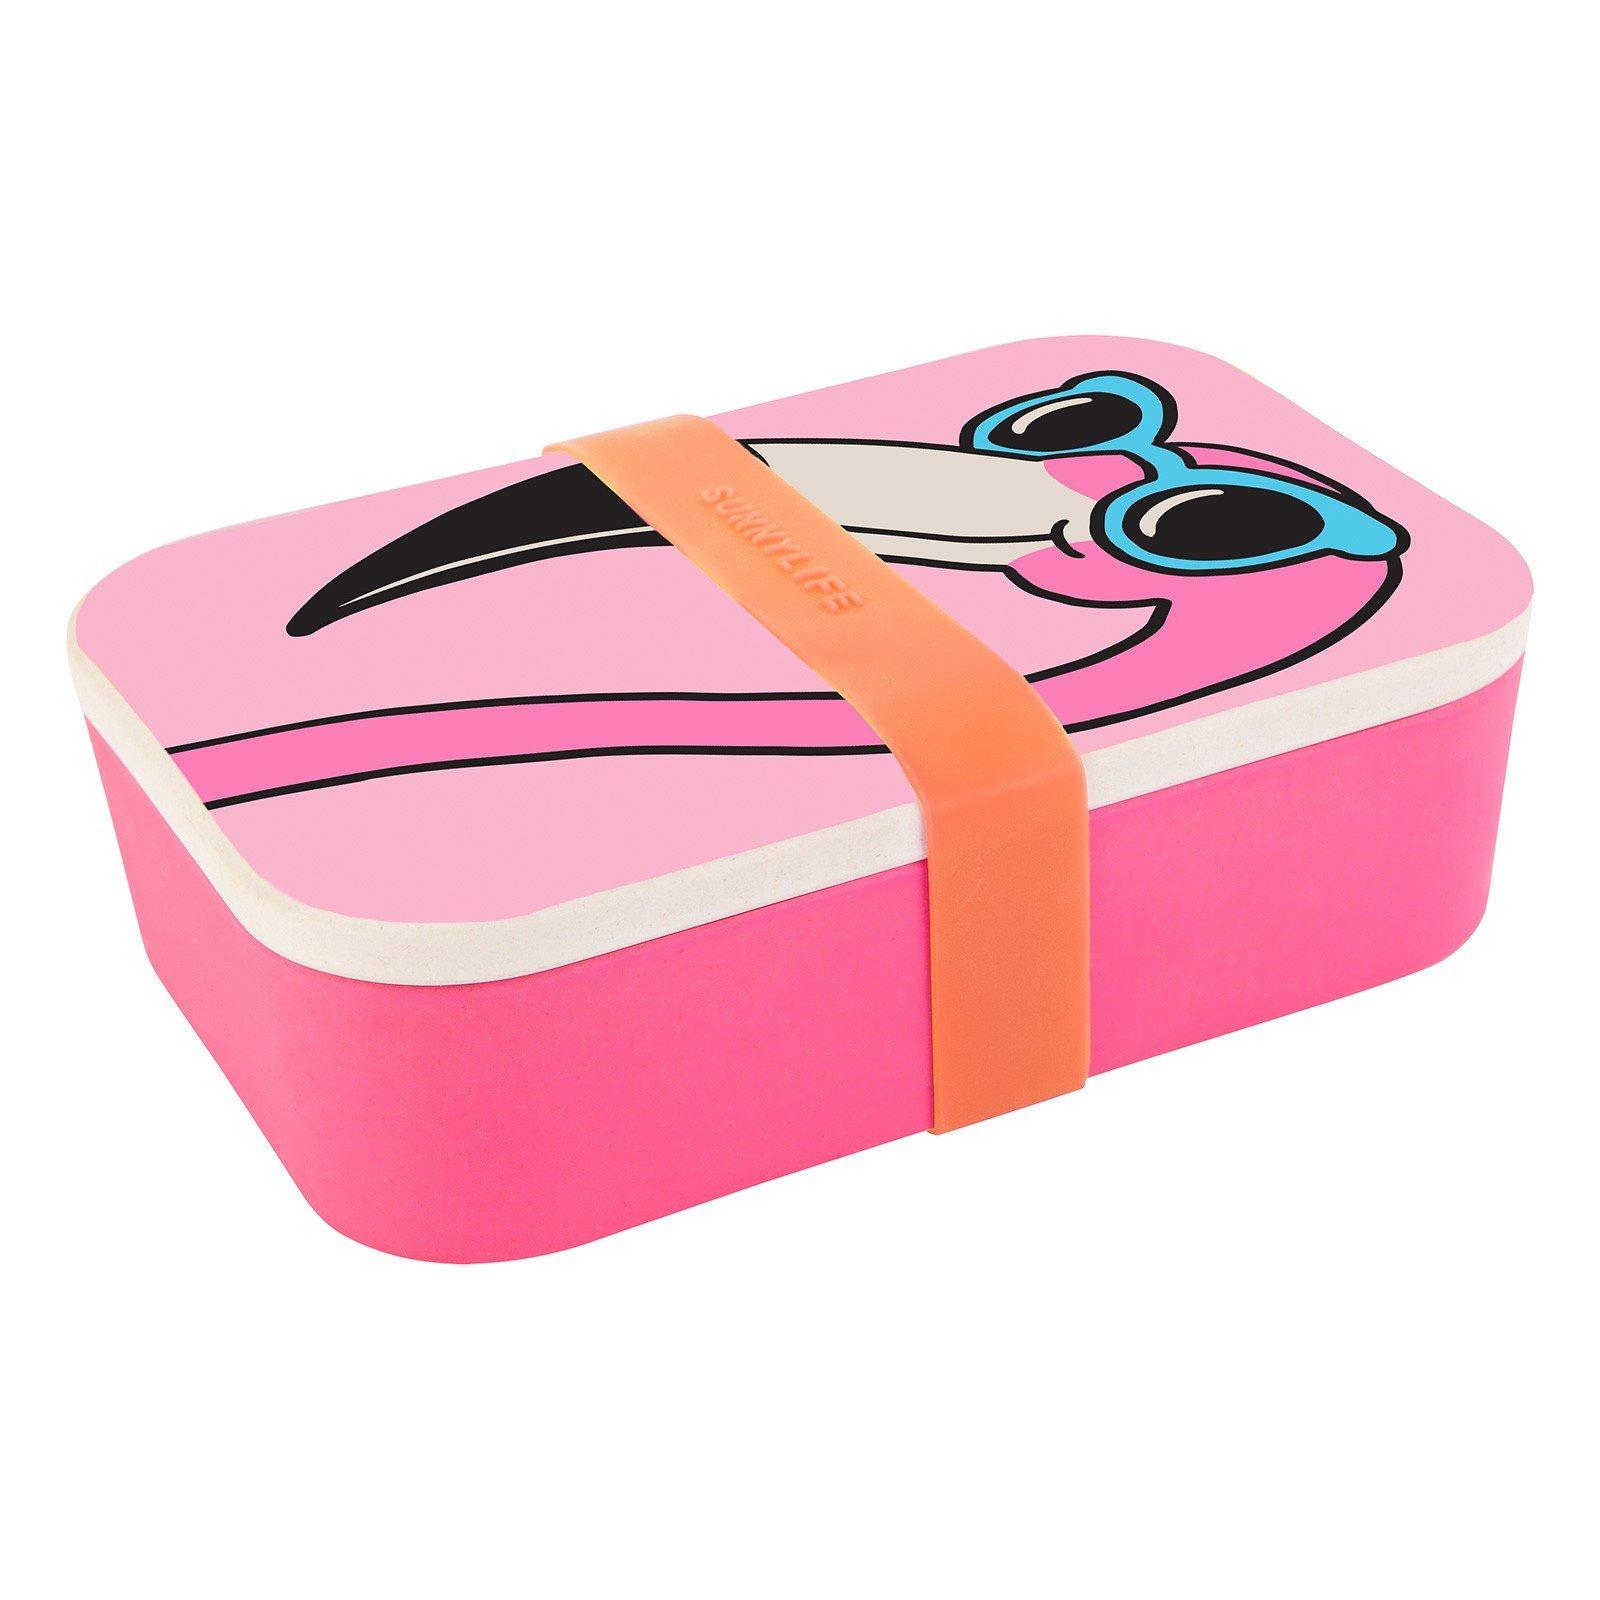 e3d131babbb5 Tiffany Cooper Pink Flamingo Lunch Box - Lunch Box Mingo